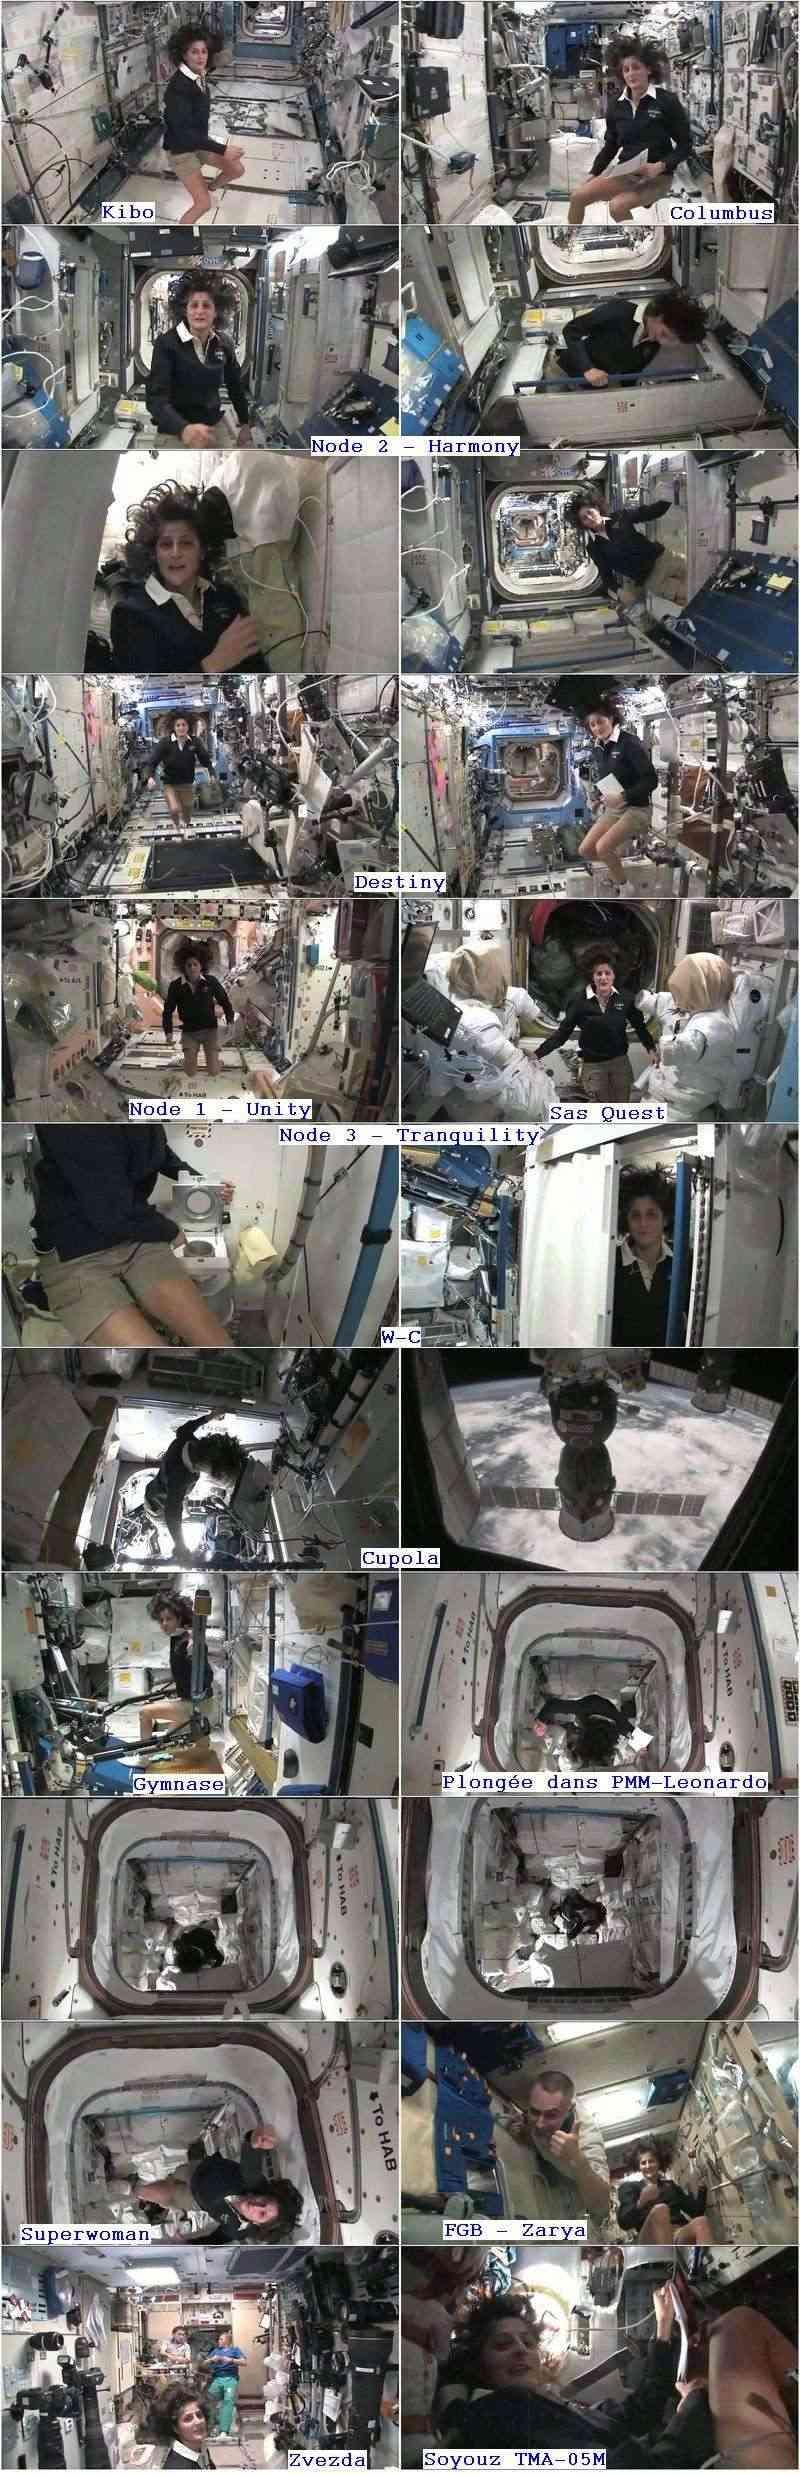 Expedition 33 - Soyouz TMA-06M - Septembre/octobre 2012 - Page 3 12111811